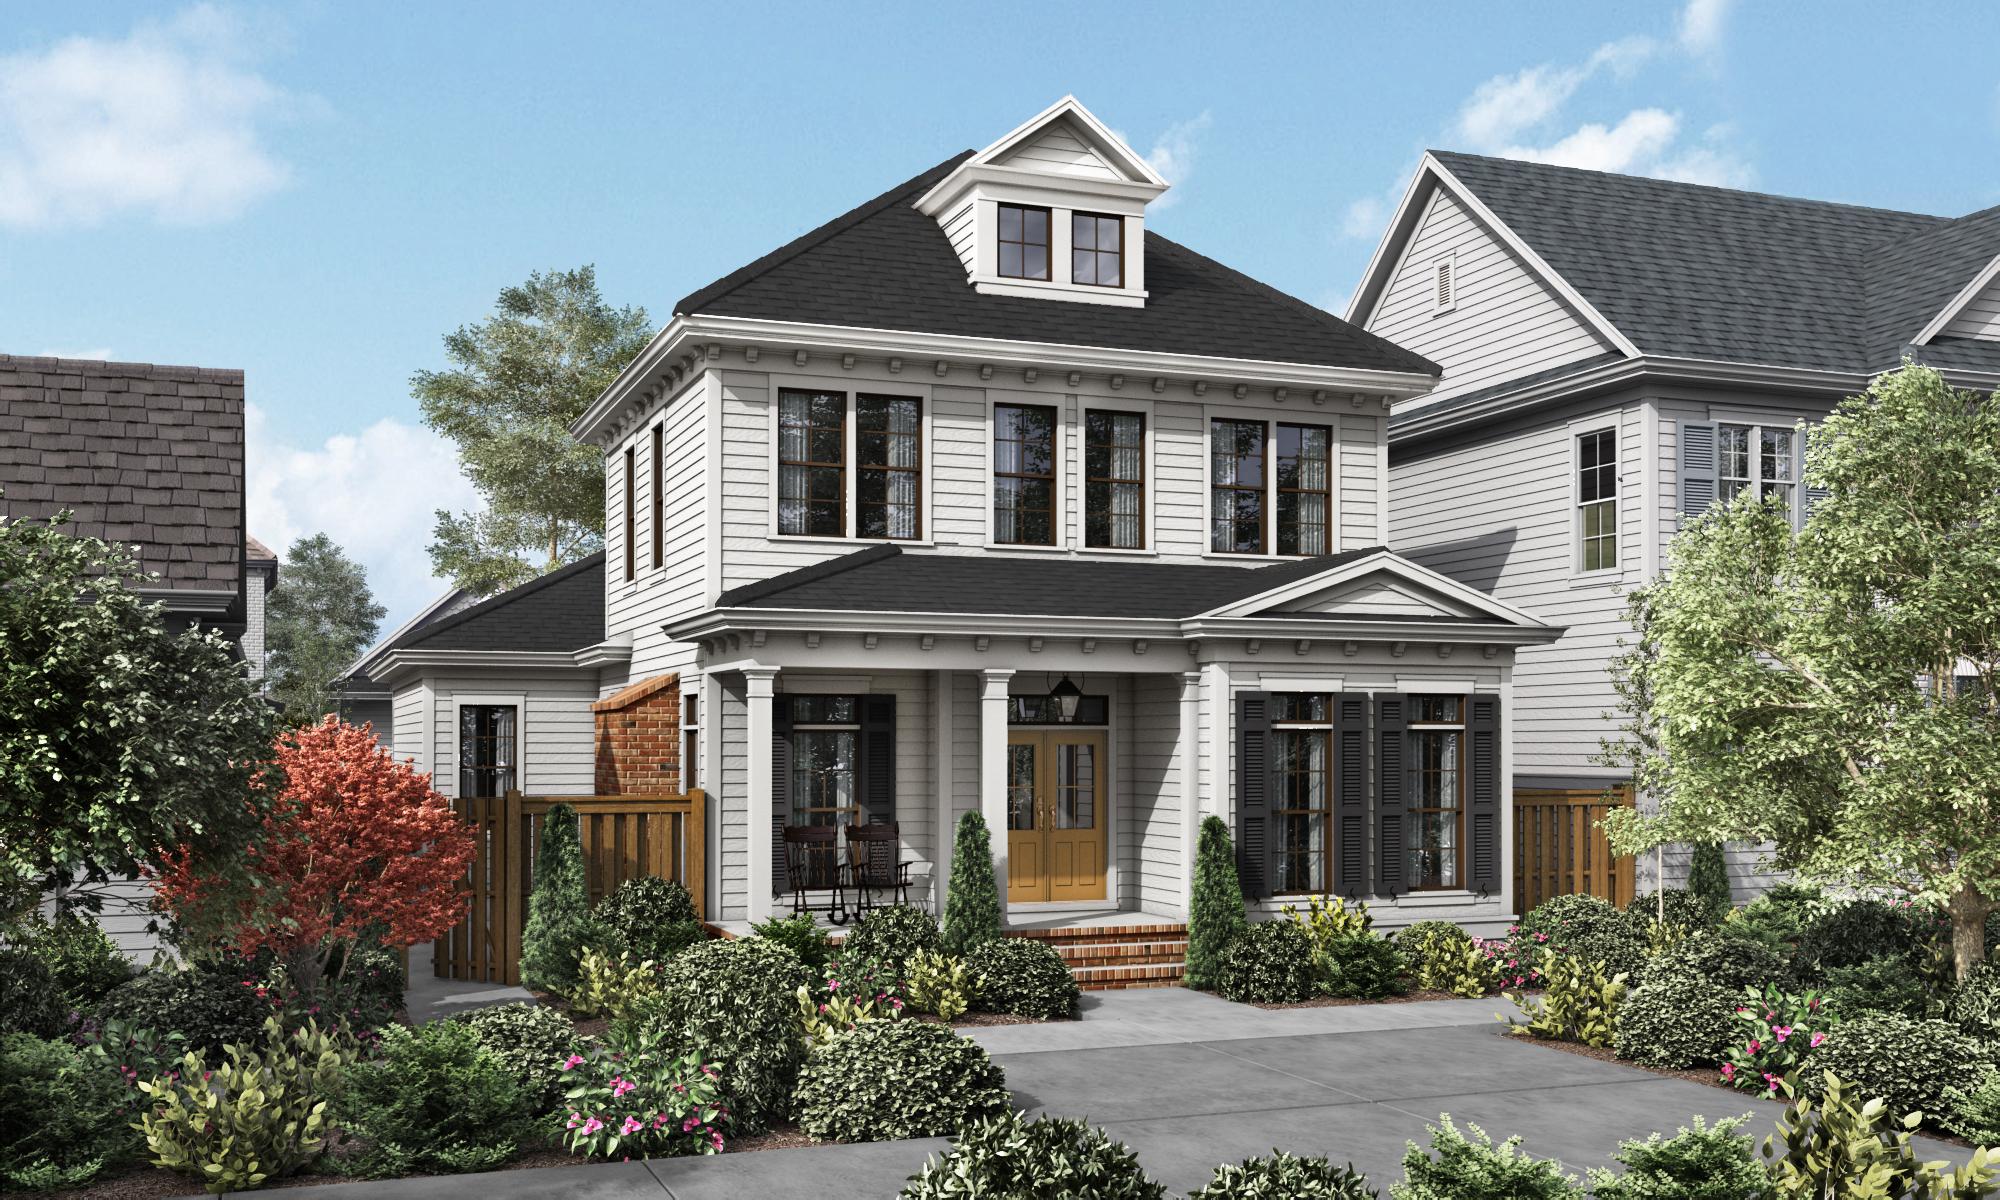 Level Homes - Baton Rouge-Adalai SCH1.jpg